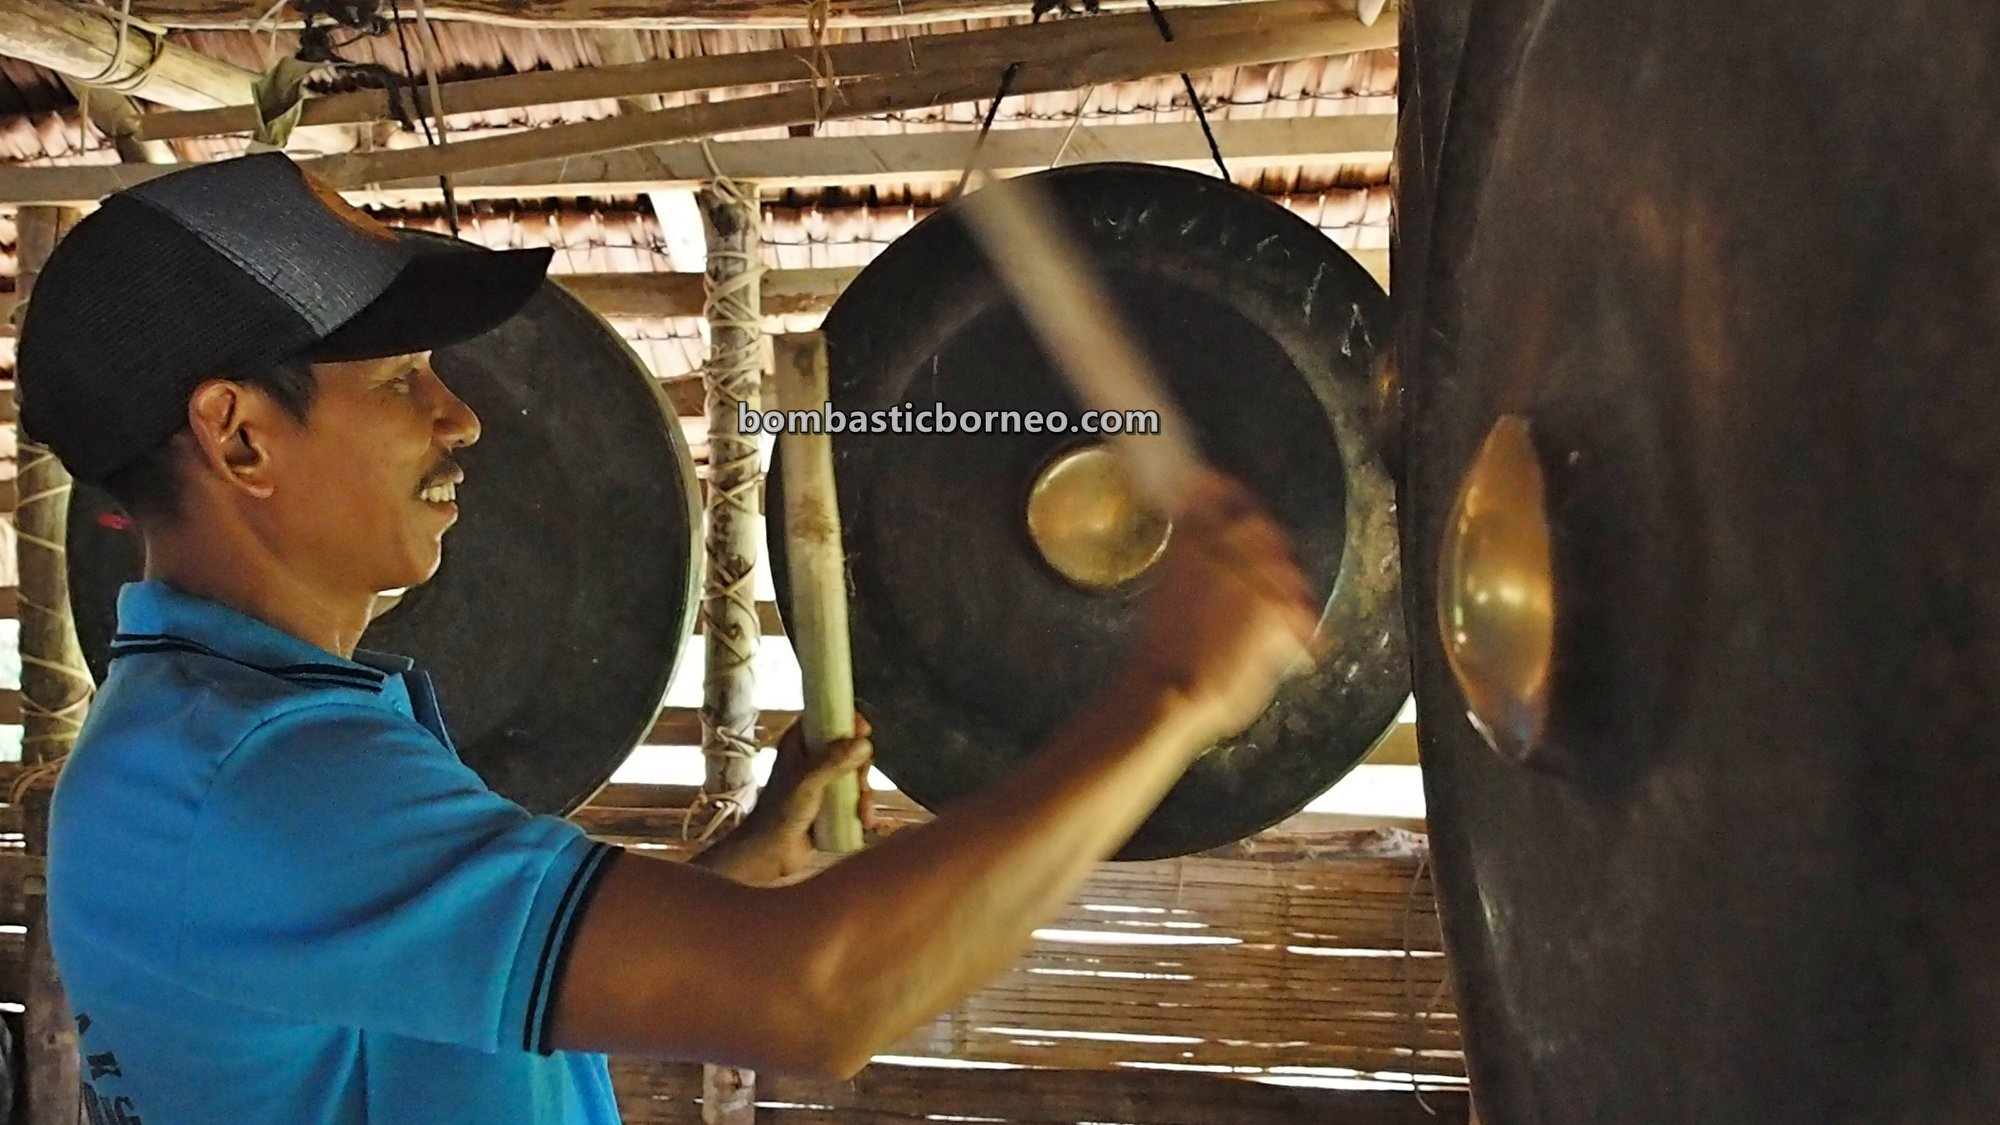 Gawai Serumpun, paddy harvest festival, Sungkung Anep, traditional, culture, Bengkayang, Dayak Bidayuh, native, highland, village, Tourism, travel guide, Borneo, 婆罗洲土著部落, 西加里曼丹丰收节, 比达友族传统文化,